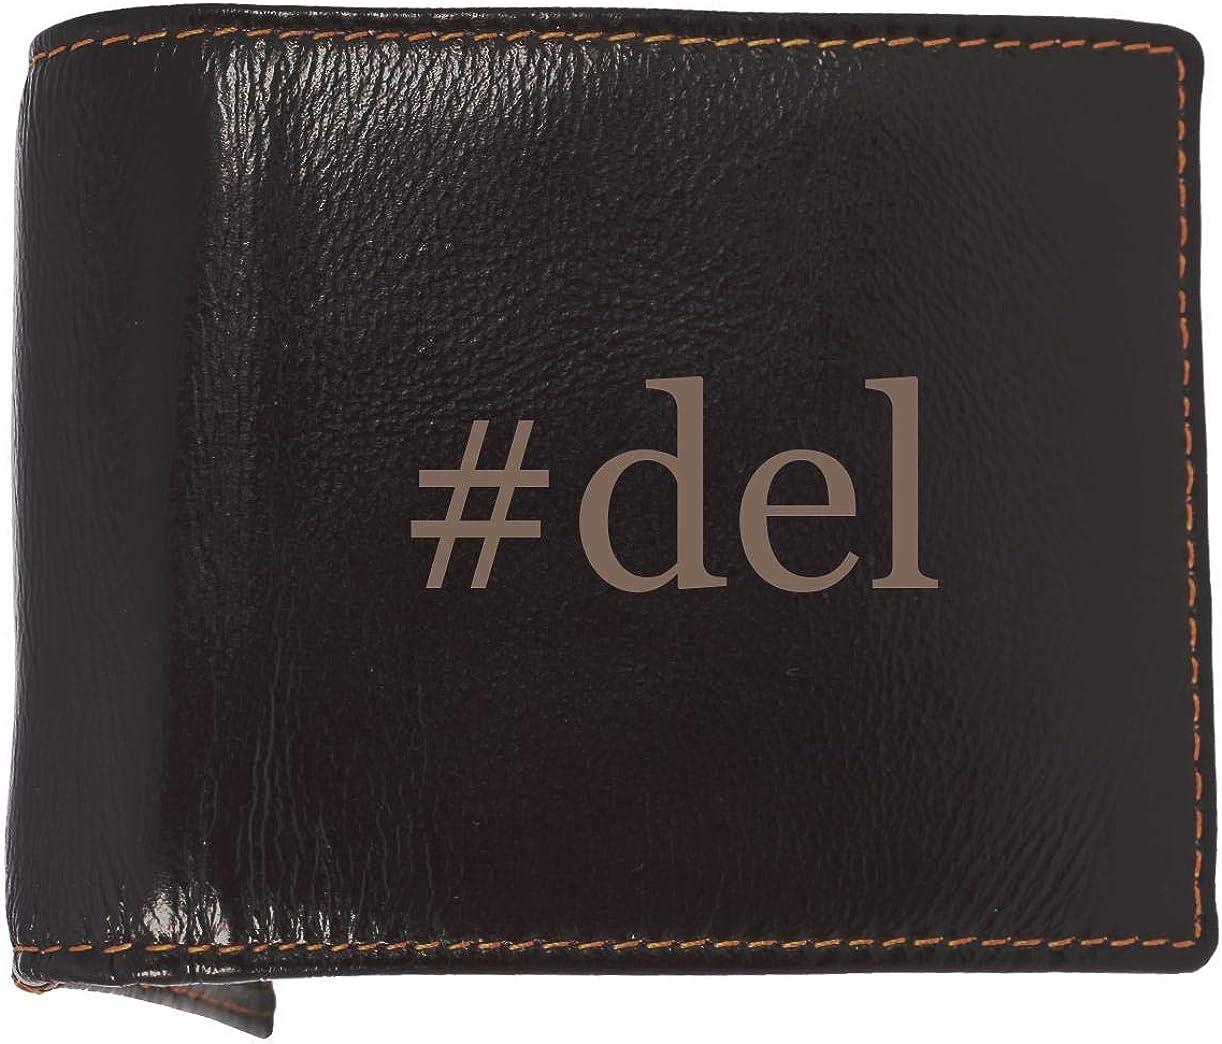 #del - Soft Hashtag Cowhide Genuine Engraved Bifold Leather Wallet 6147c2BtqmaL